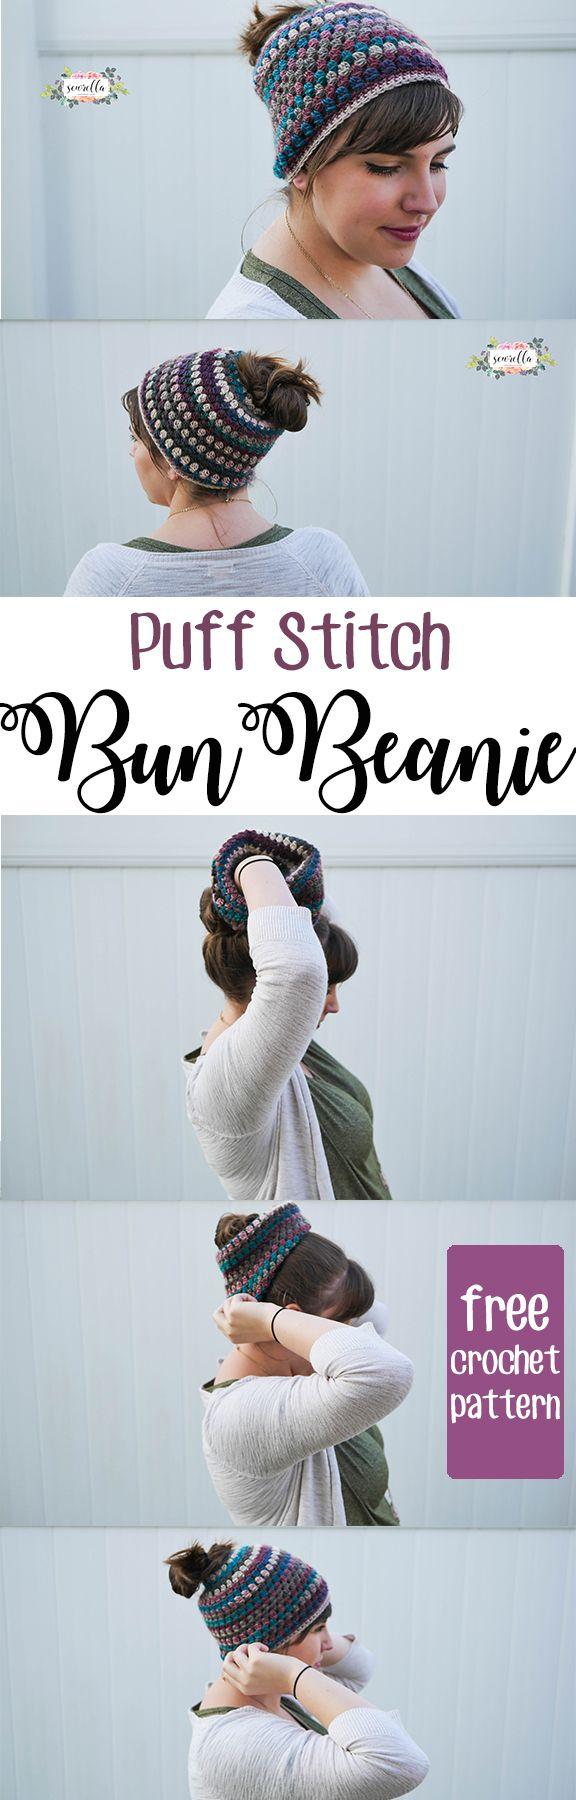 puff stitch crochet bun beanie or messy bun hat or mom bun hat | perfect for pulling that bun through a fashionable, warm hat! | A quick, easy beginner free pattern from Sewrella